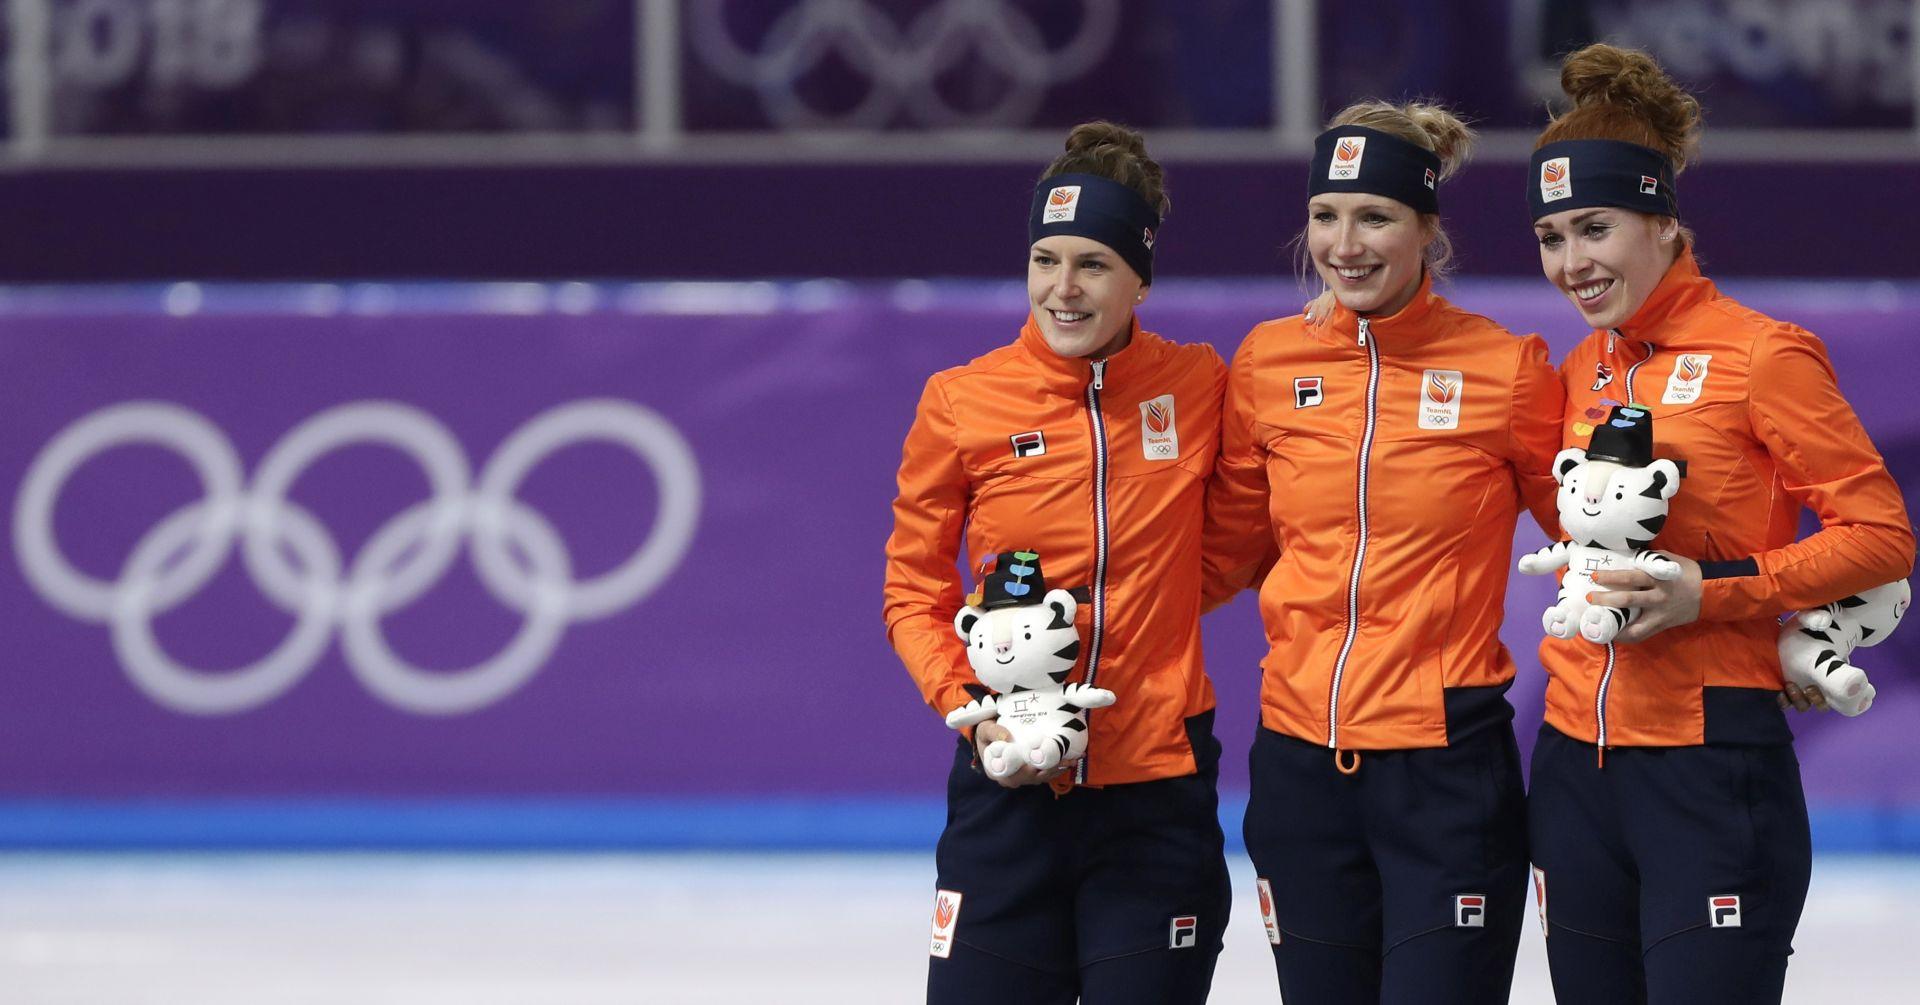 ZOI Wust osvojila rekordnu desetu medalju